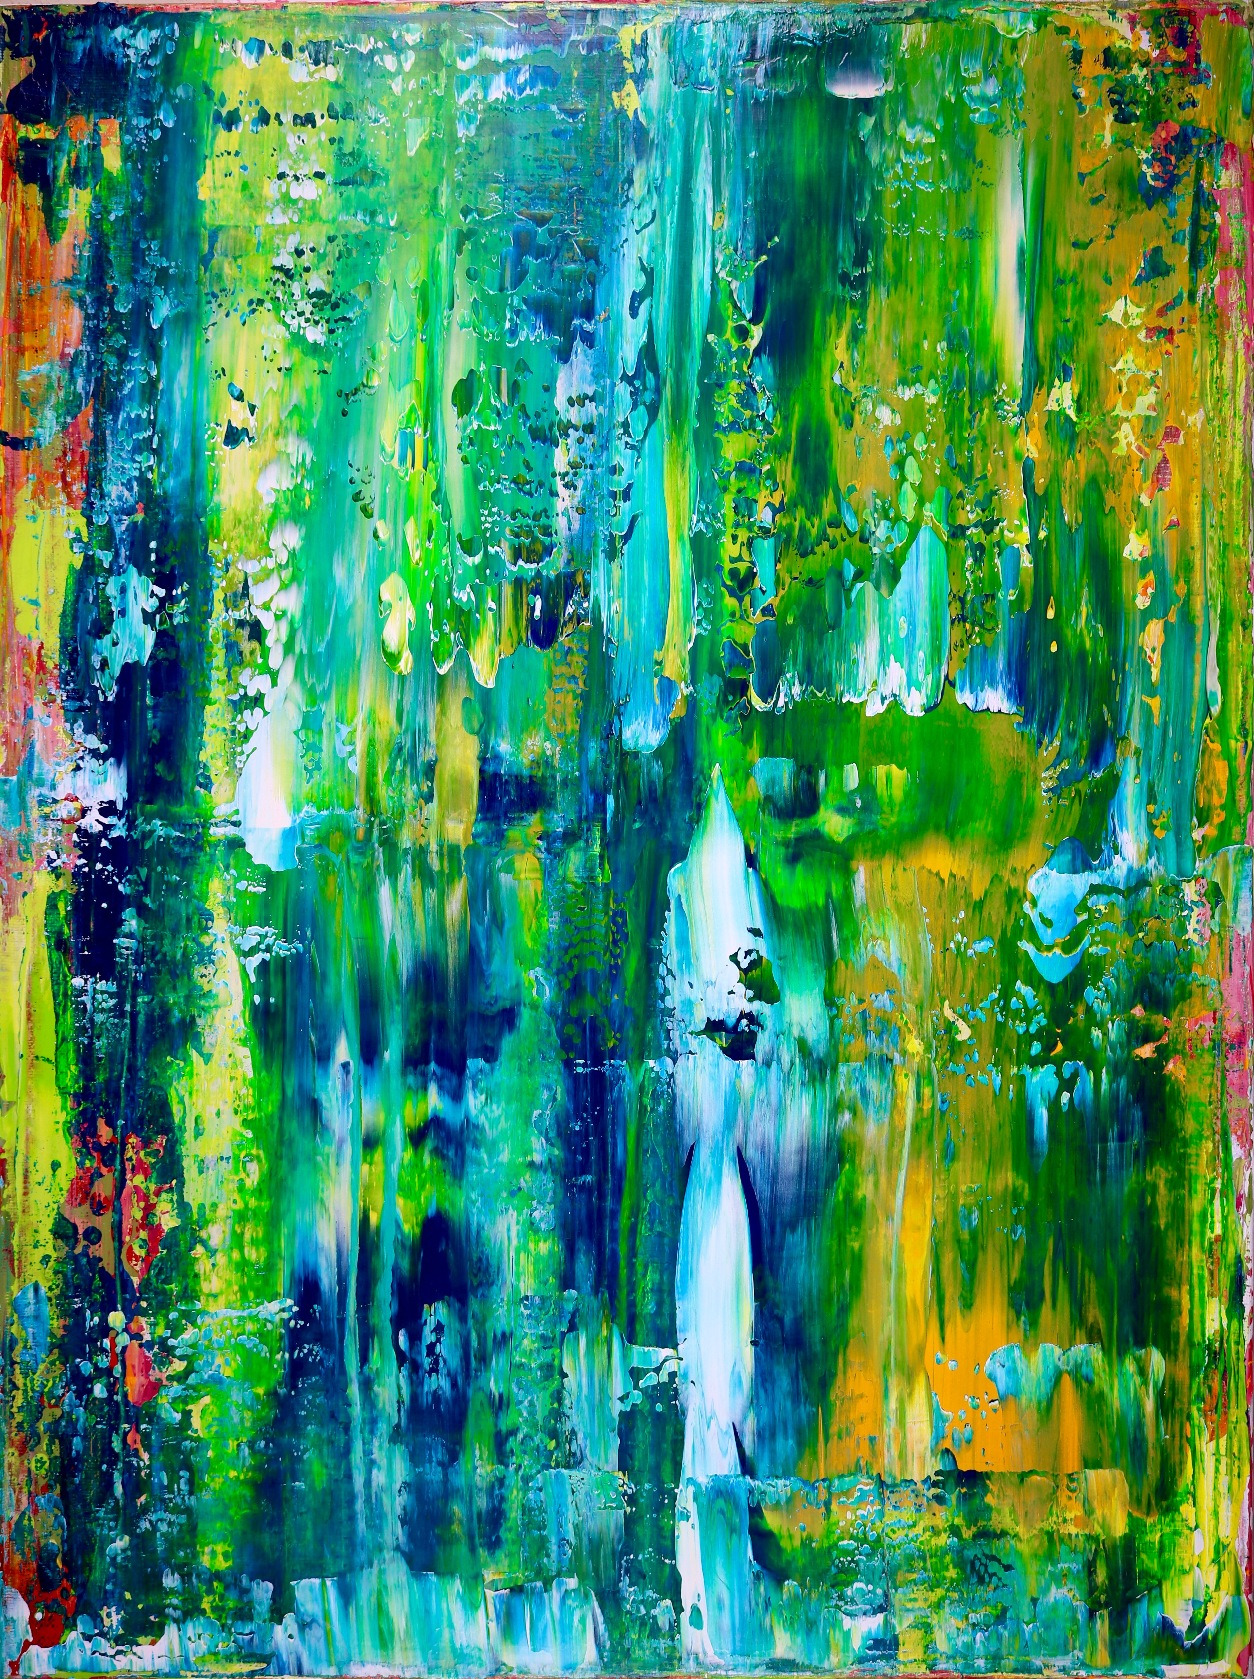 Enchanted Spectra 1 - SOLD - Nestor Toro